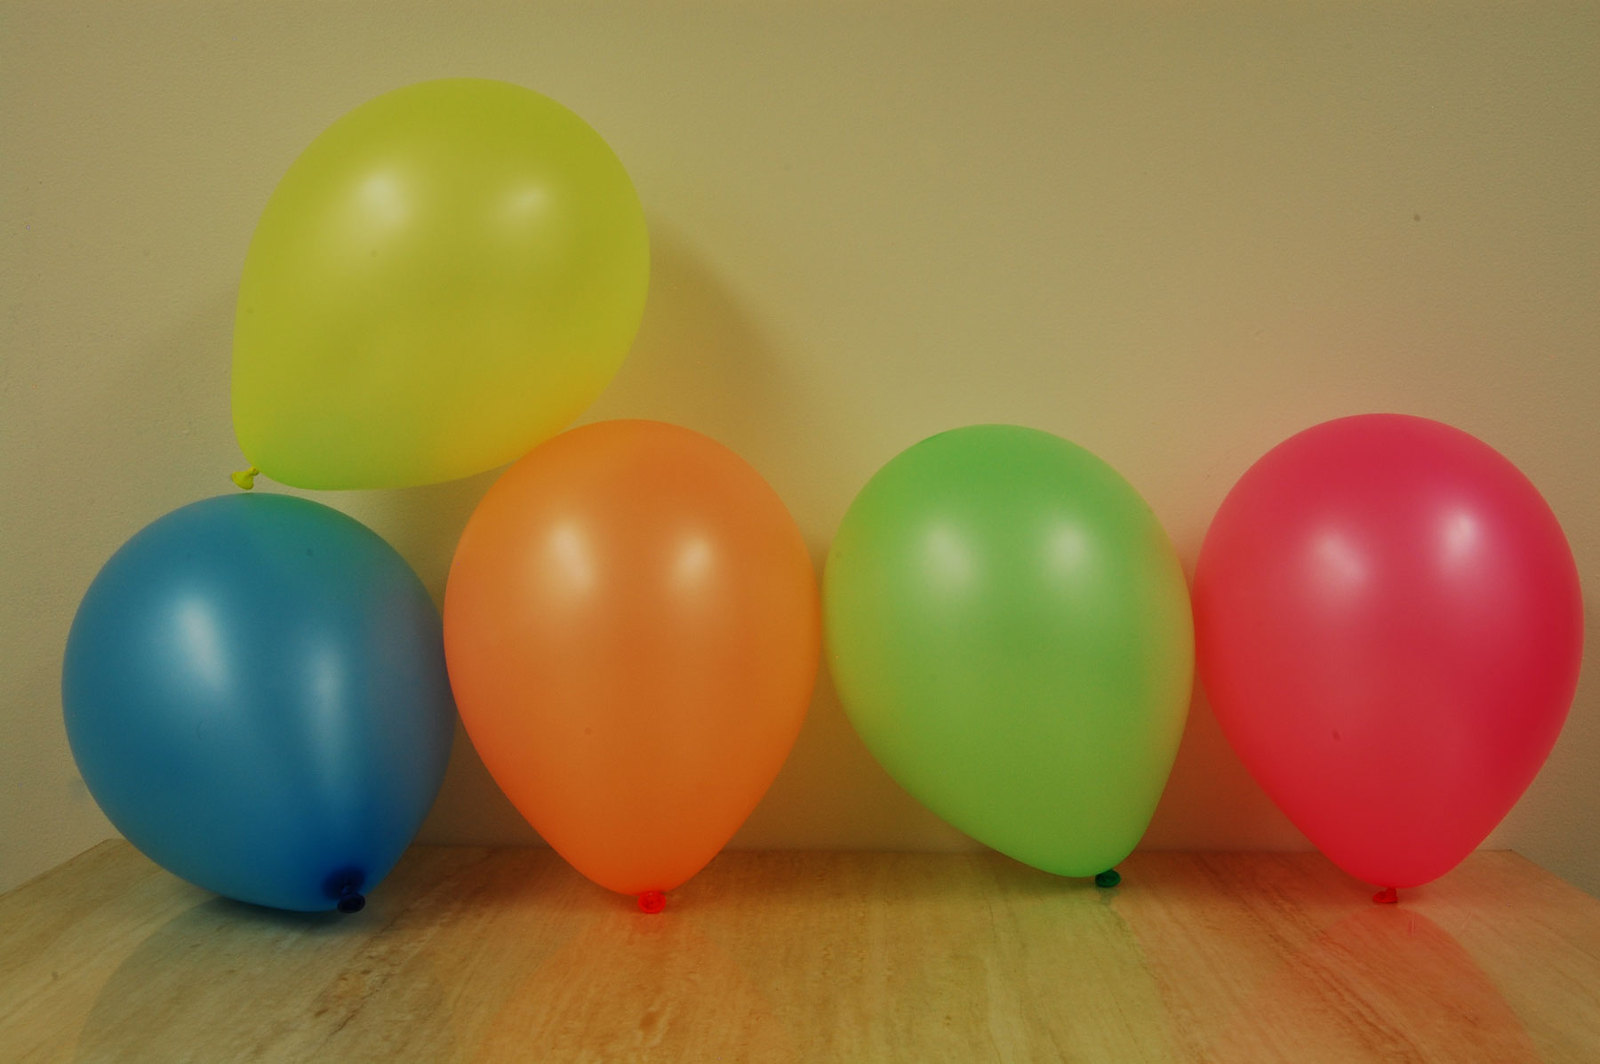 12oz 40ct Assorted Blacklight Reactive Hard Plastic Cups + Blacklight Balloons